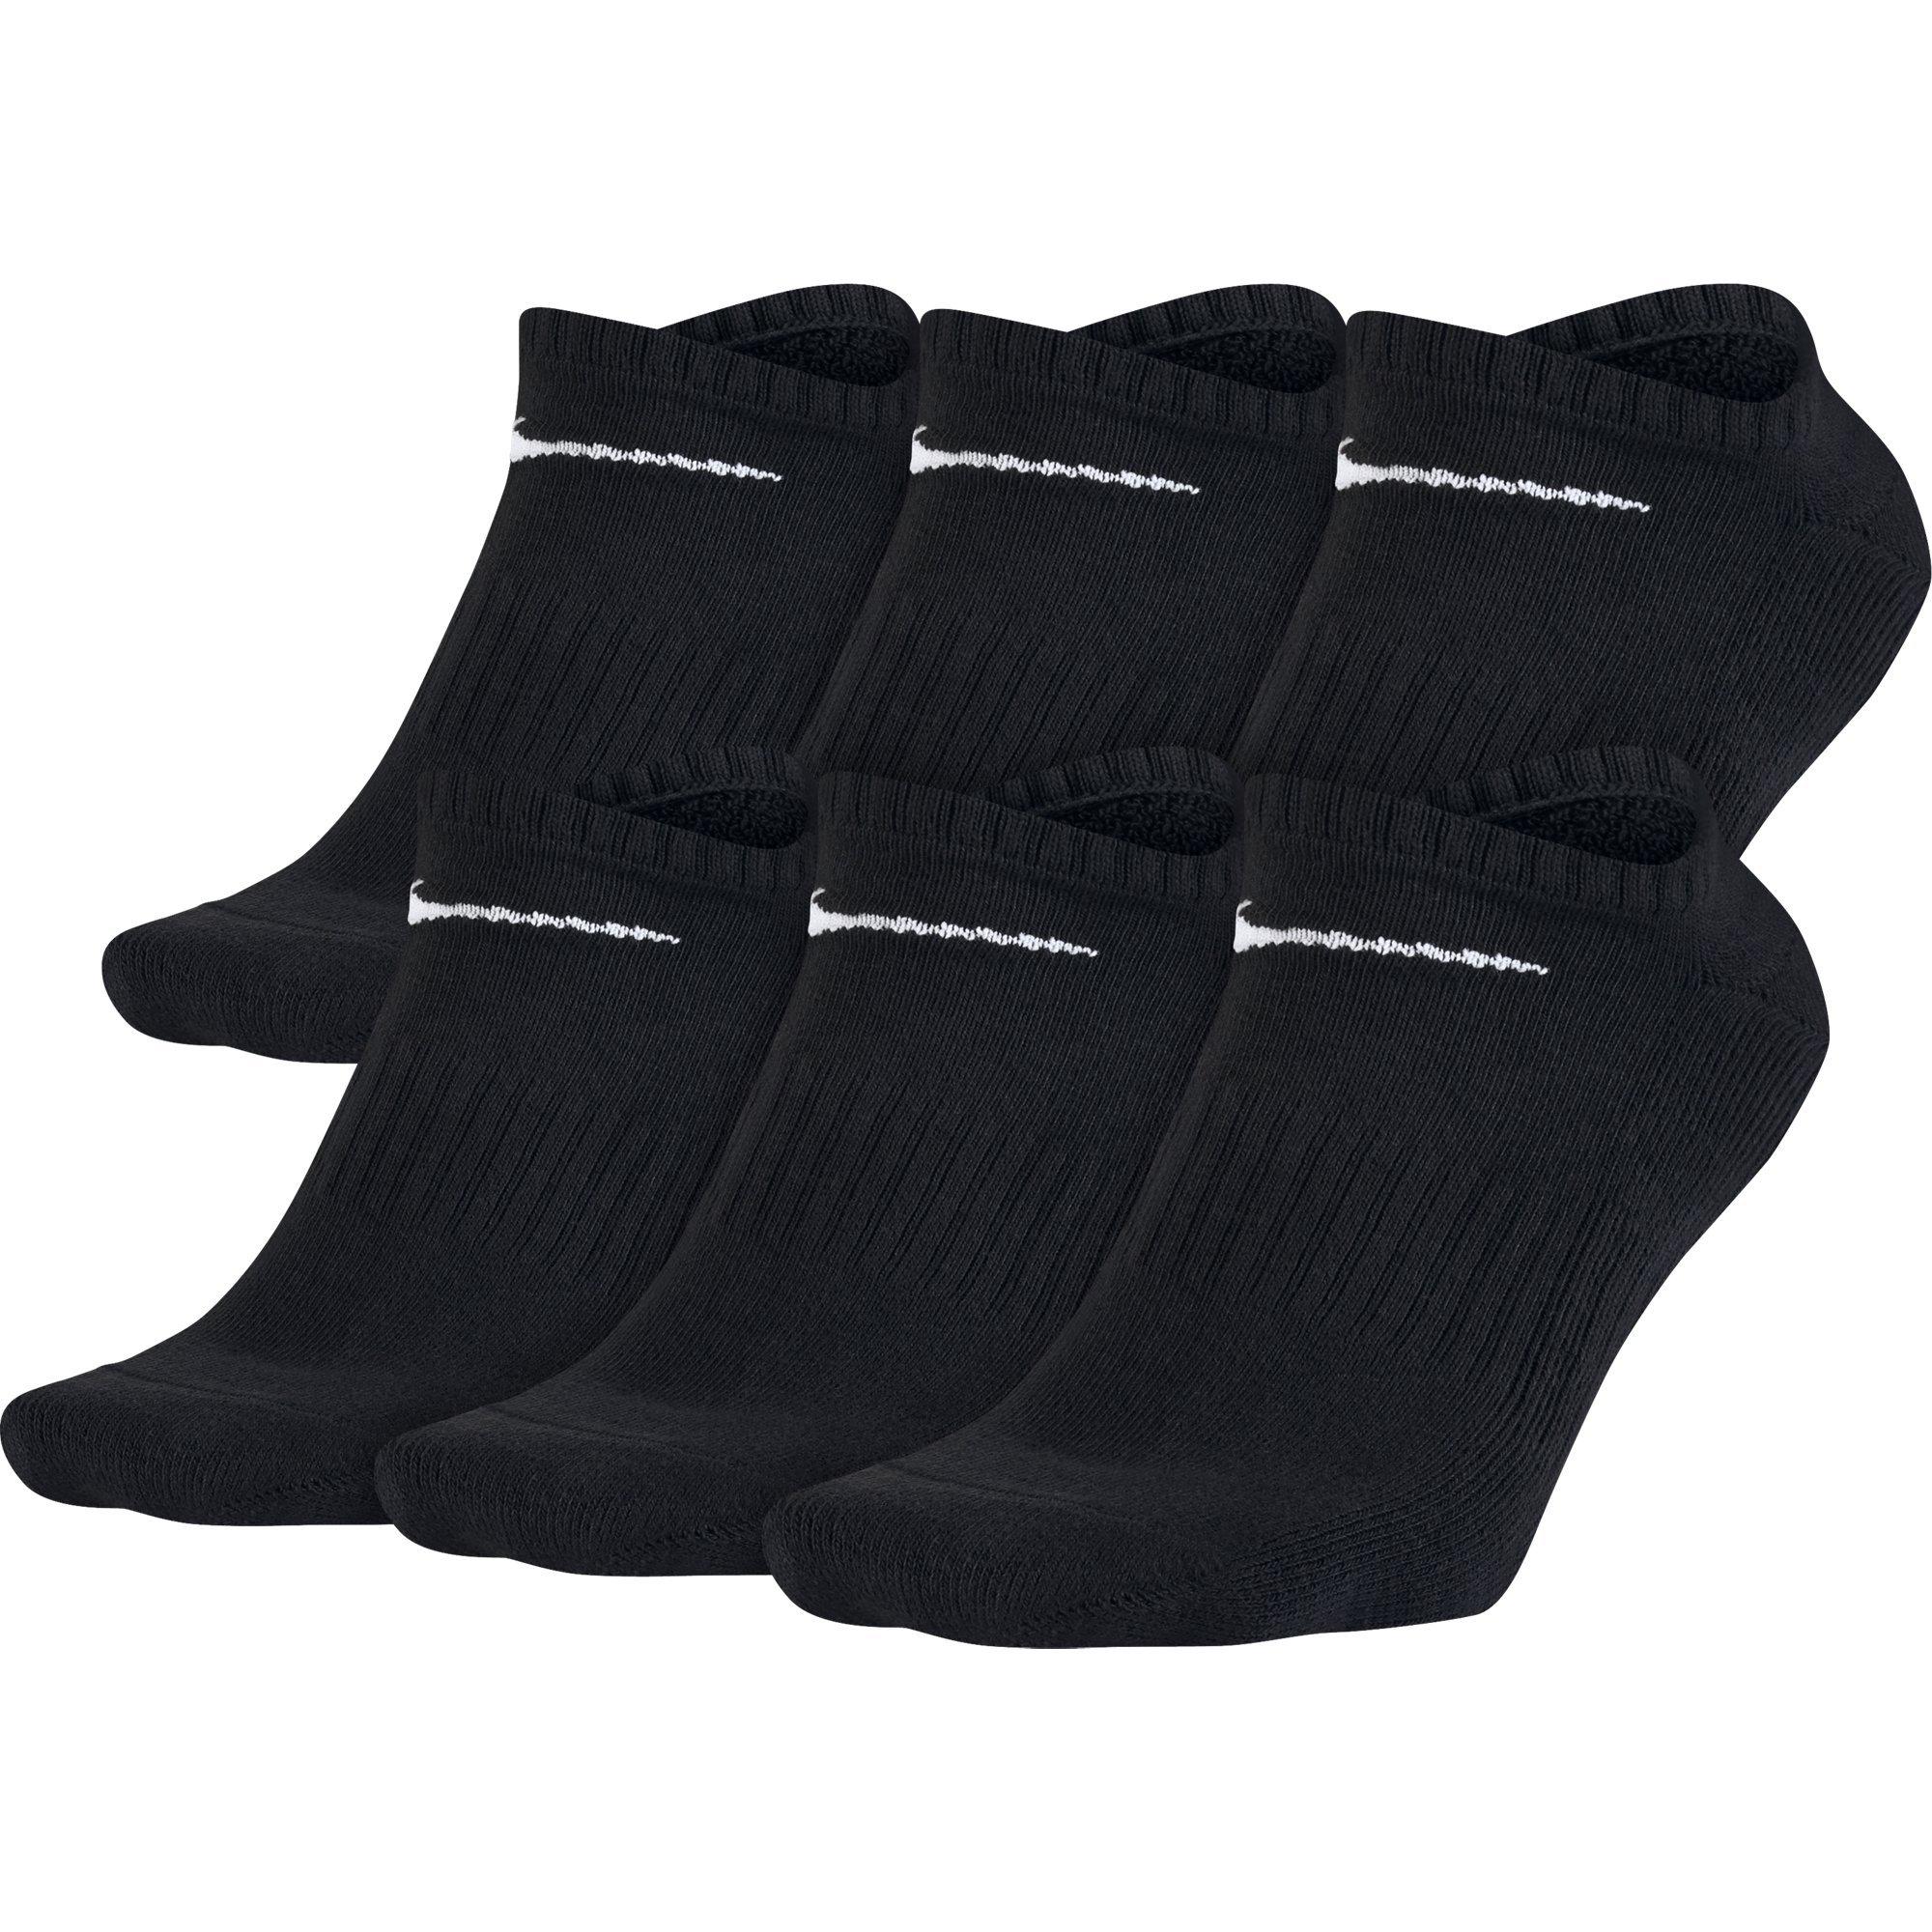 NIKE Unisex Performance Cushion No-Show Socks with Band (6 Pairs), Black/White, Large by Nike